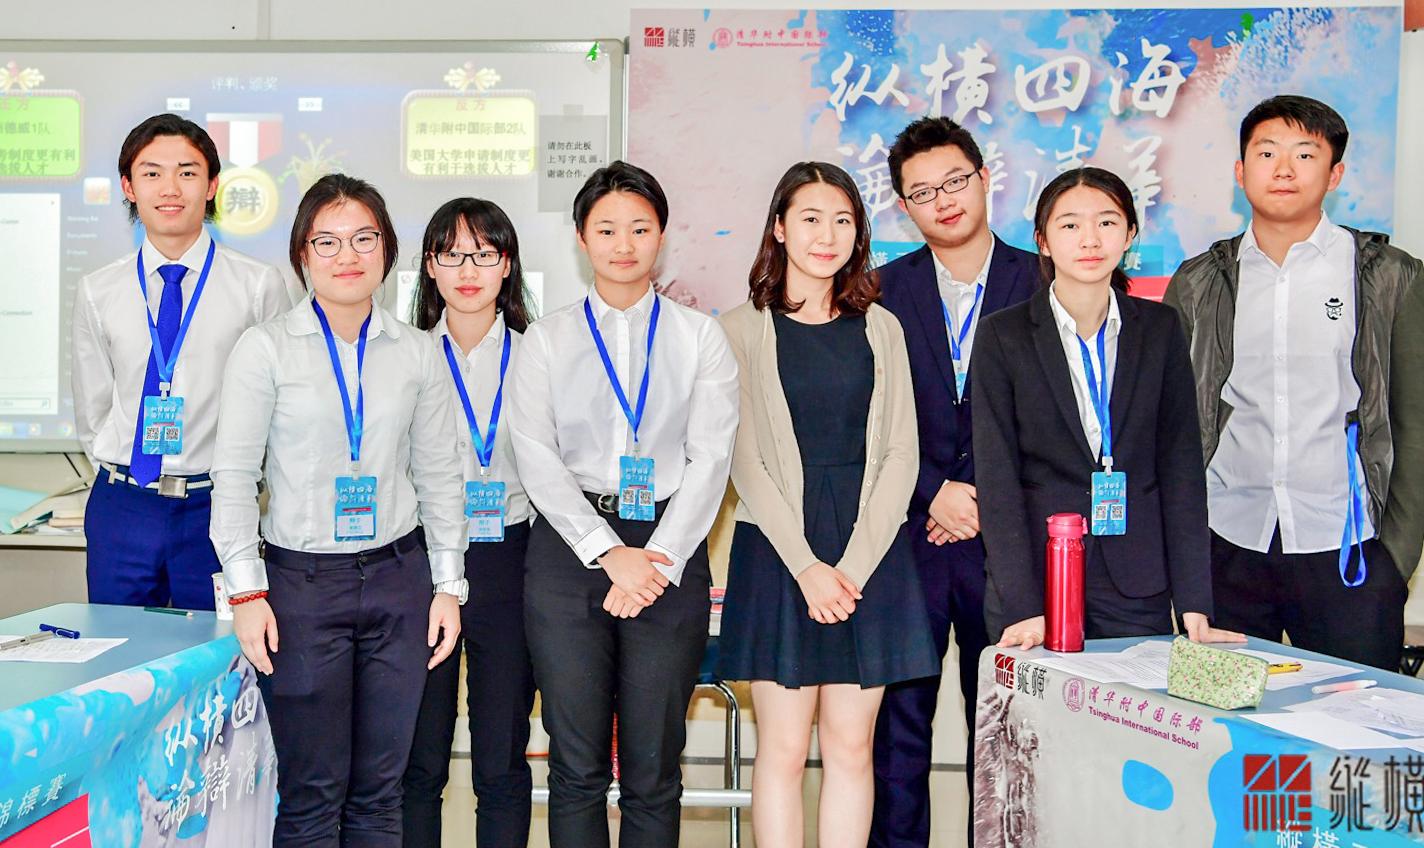 01-images-Dulwich_International_High_School_Suzhou